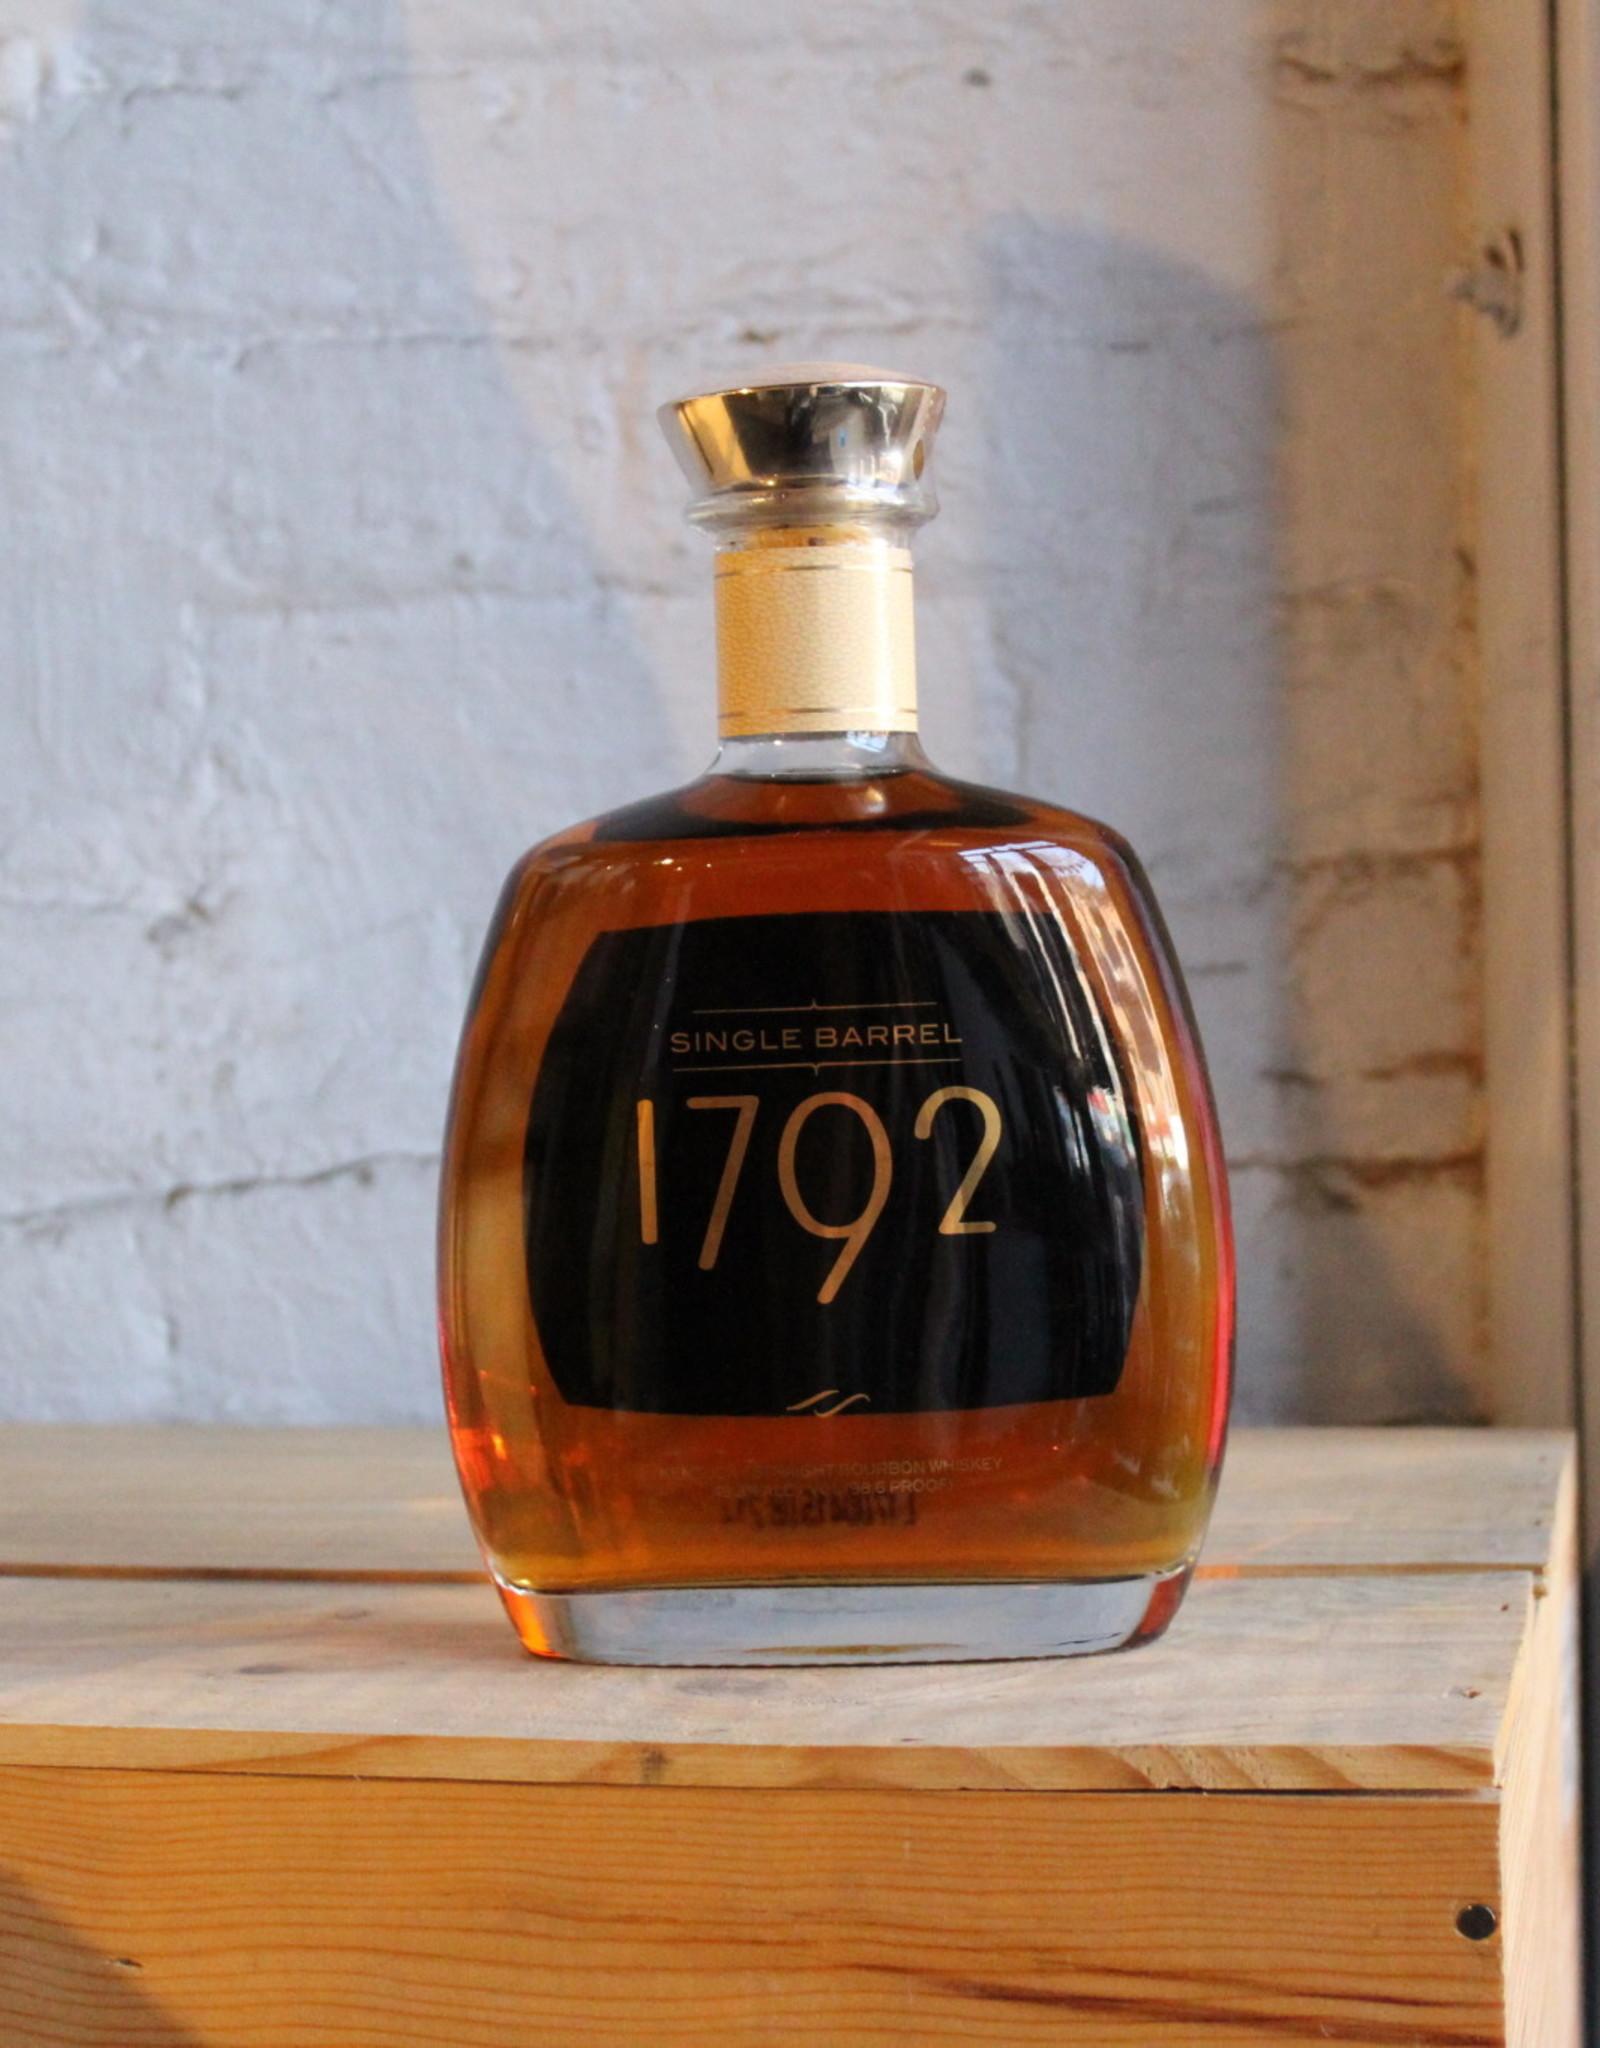 1792 Single Barrel Kentucky Bourbon Whisky - Bardstown, KY (750ml)